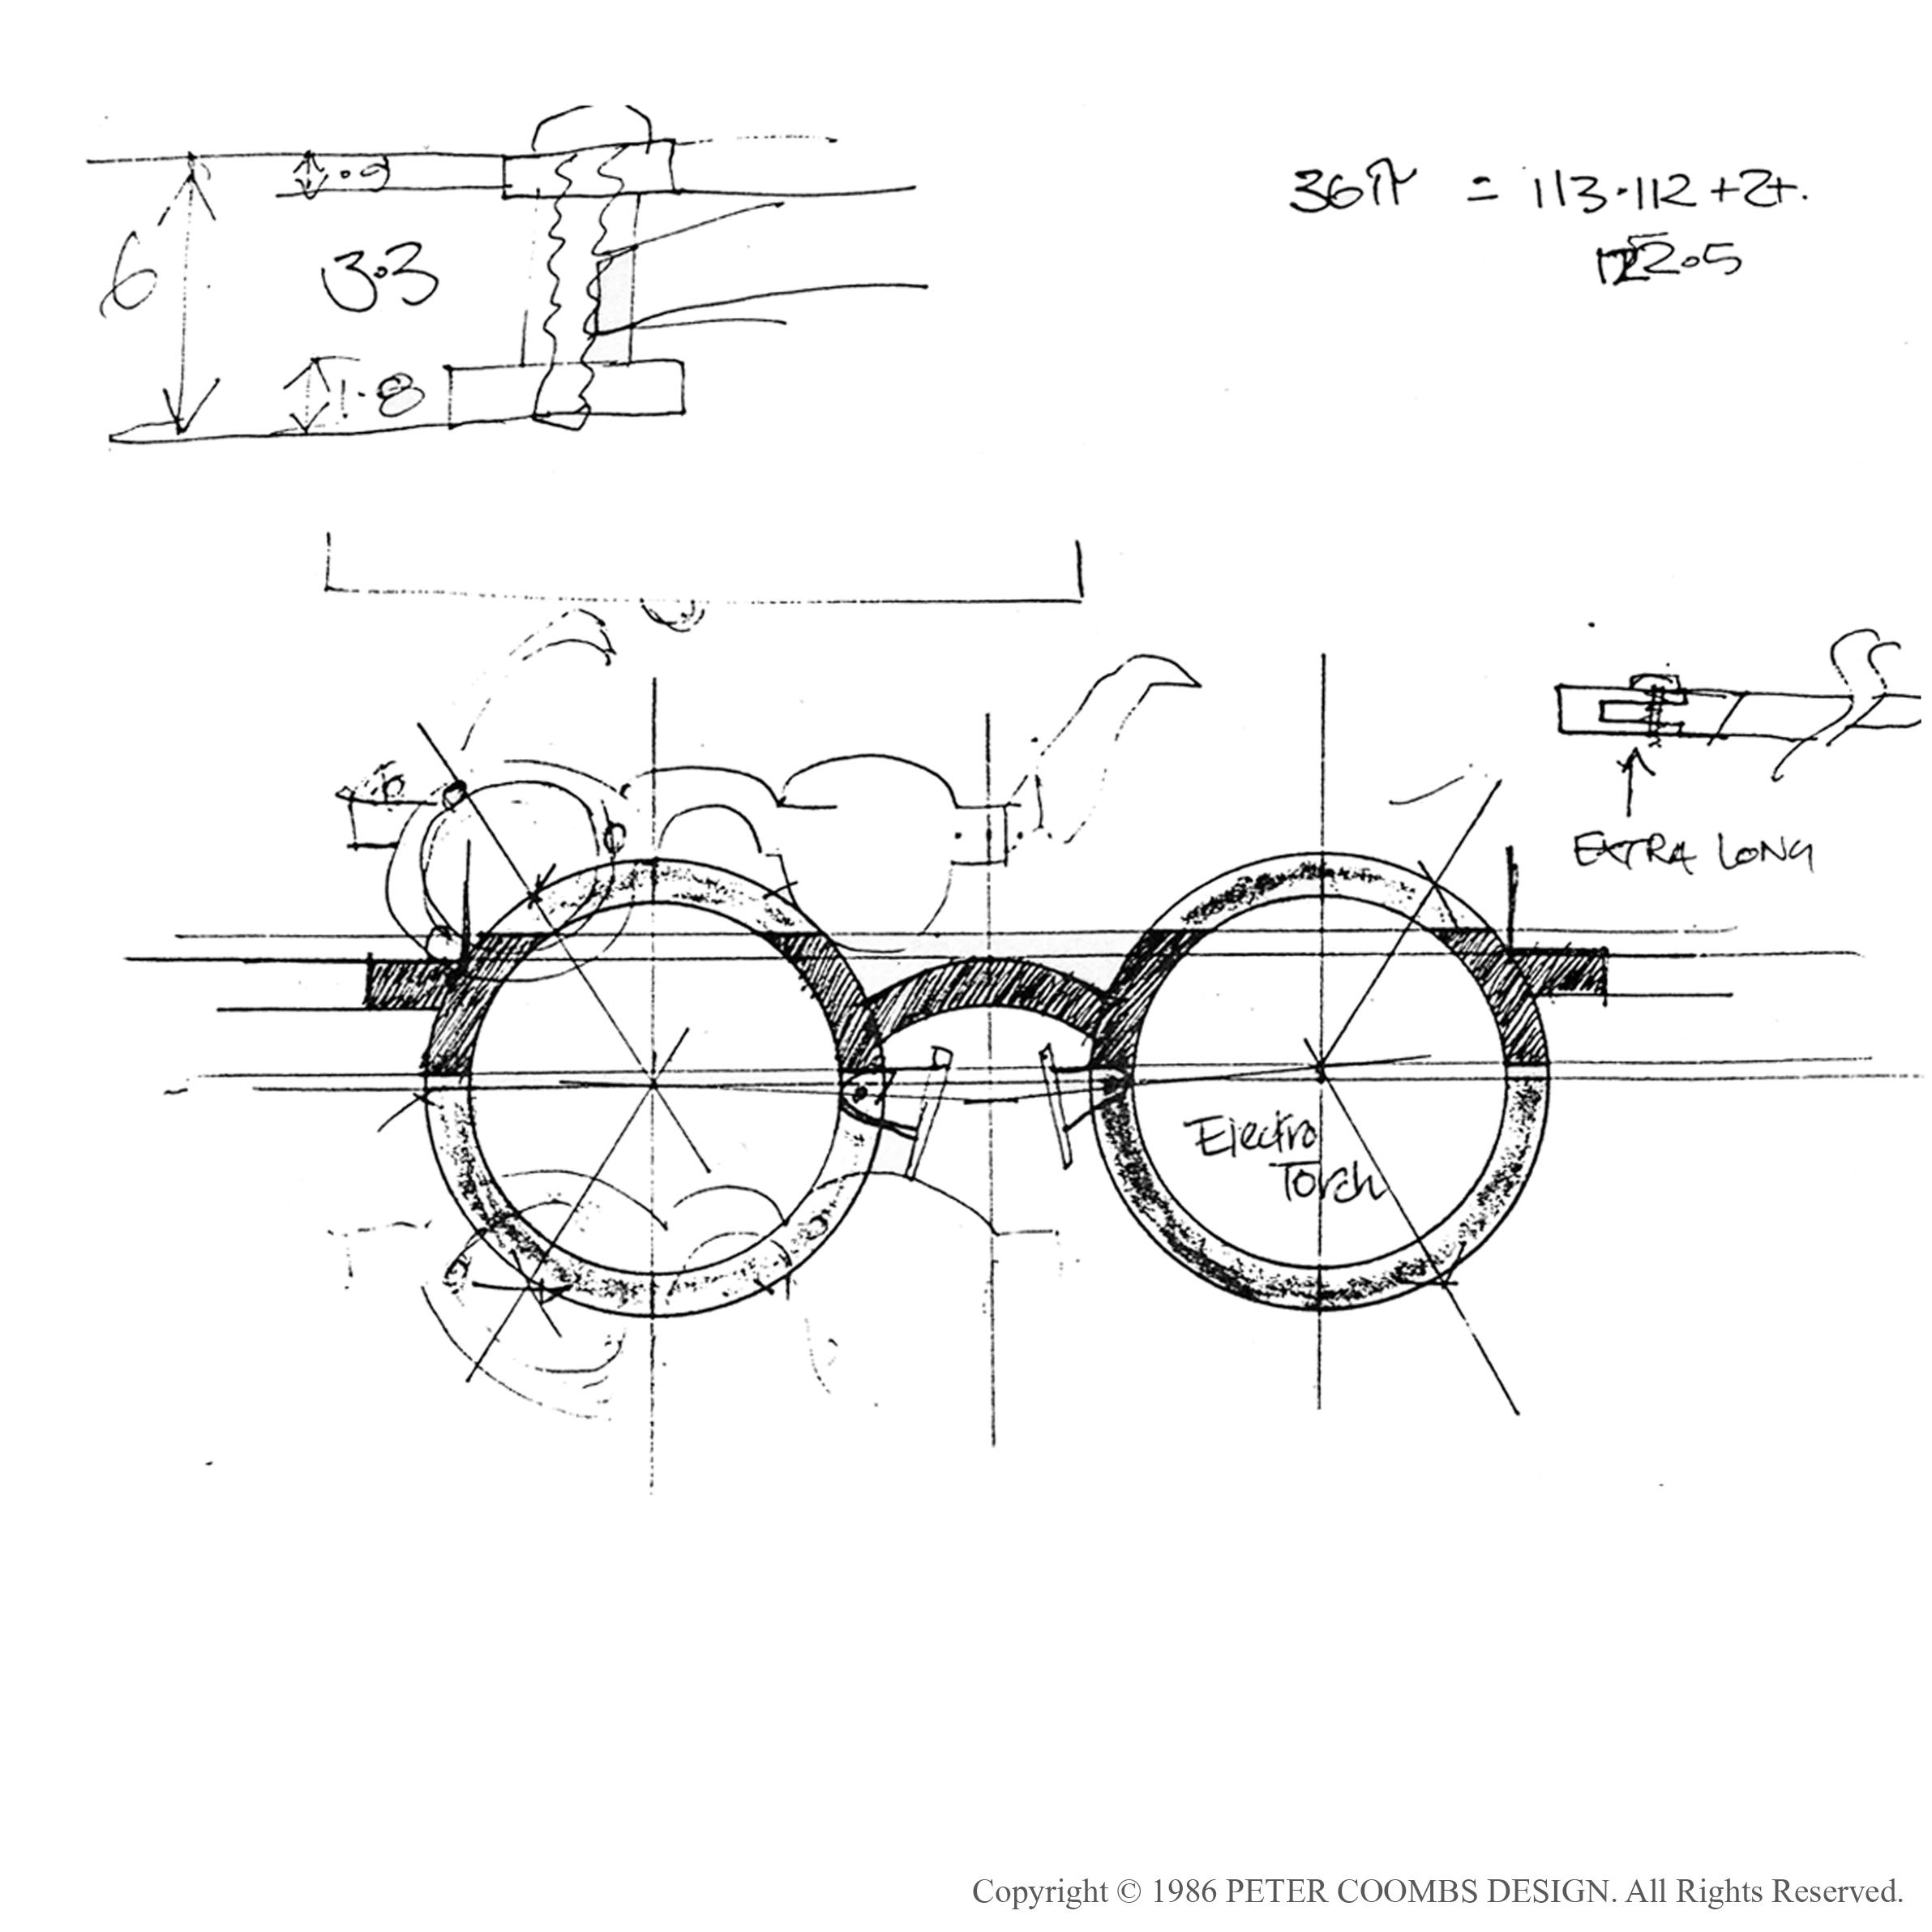 PeterCoombsEyewear_ElectroTorch_drawing